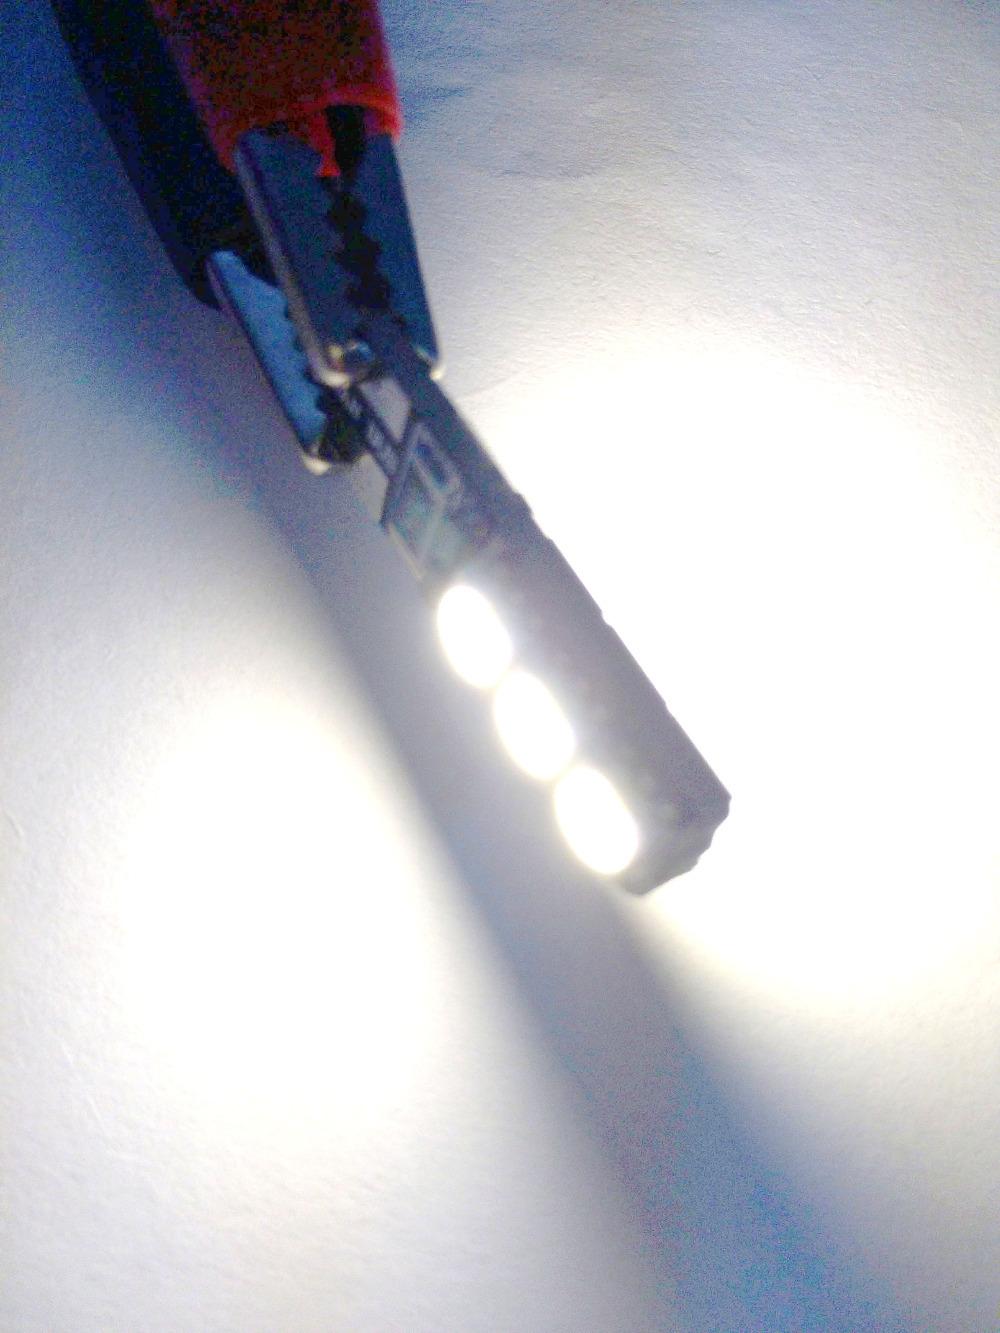 2pcs lot Bright Double No Error T10 LED 194 168 W5W Canbus 6 SMD 5050 LED